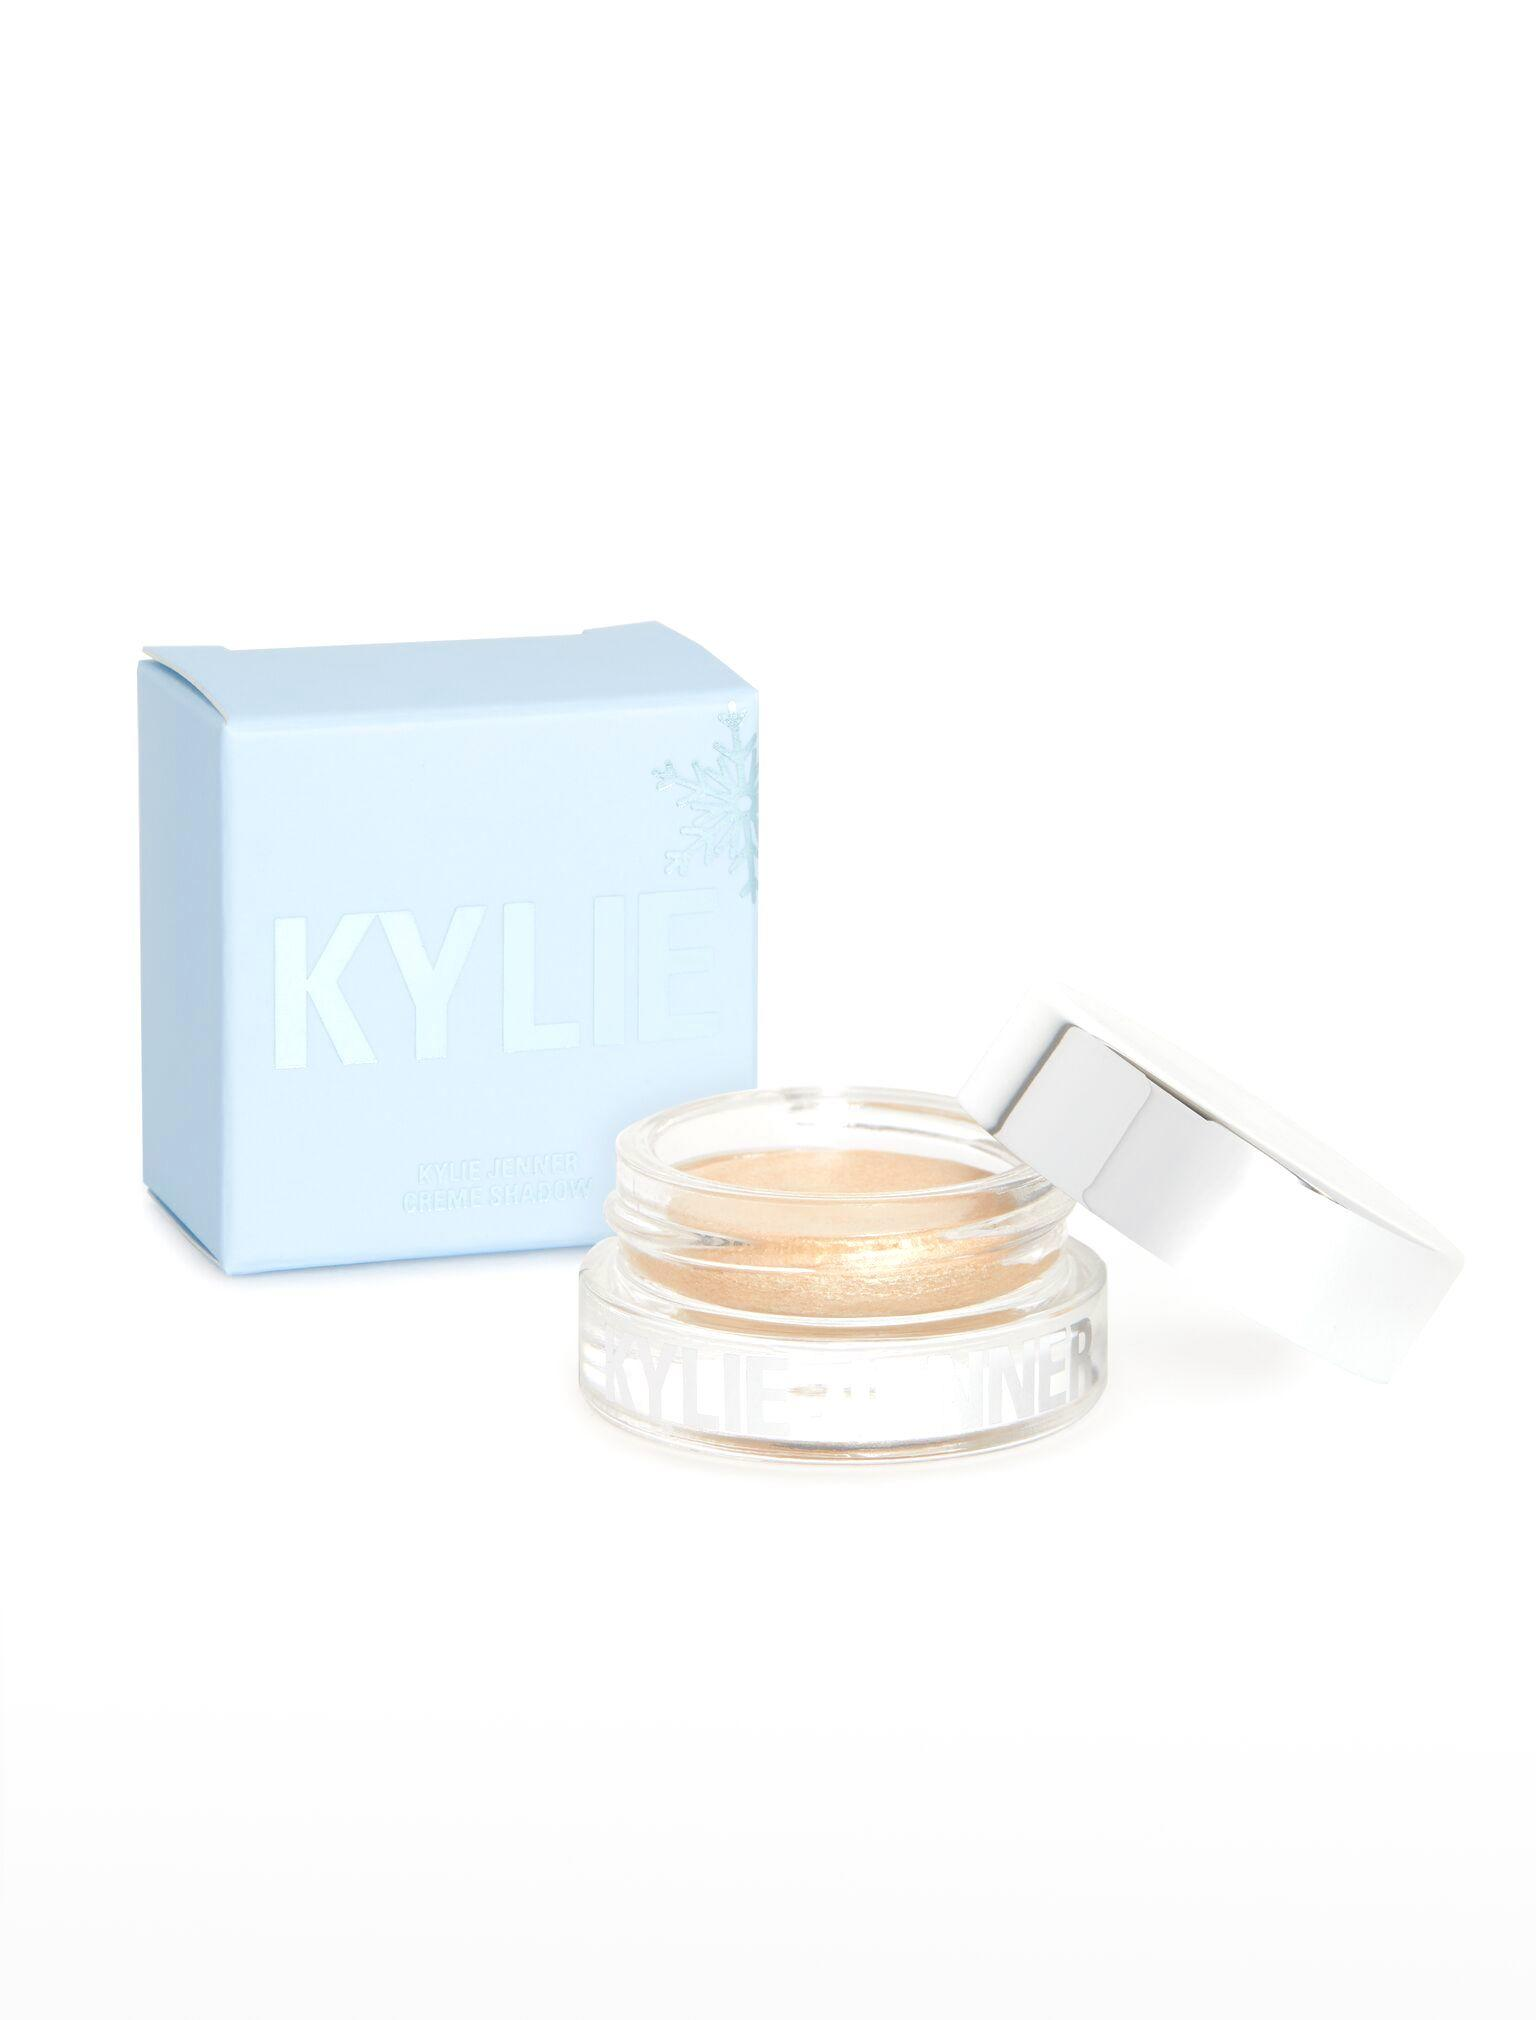 Kylie Creme Gel Shadow Holiday Edition Snowflake